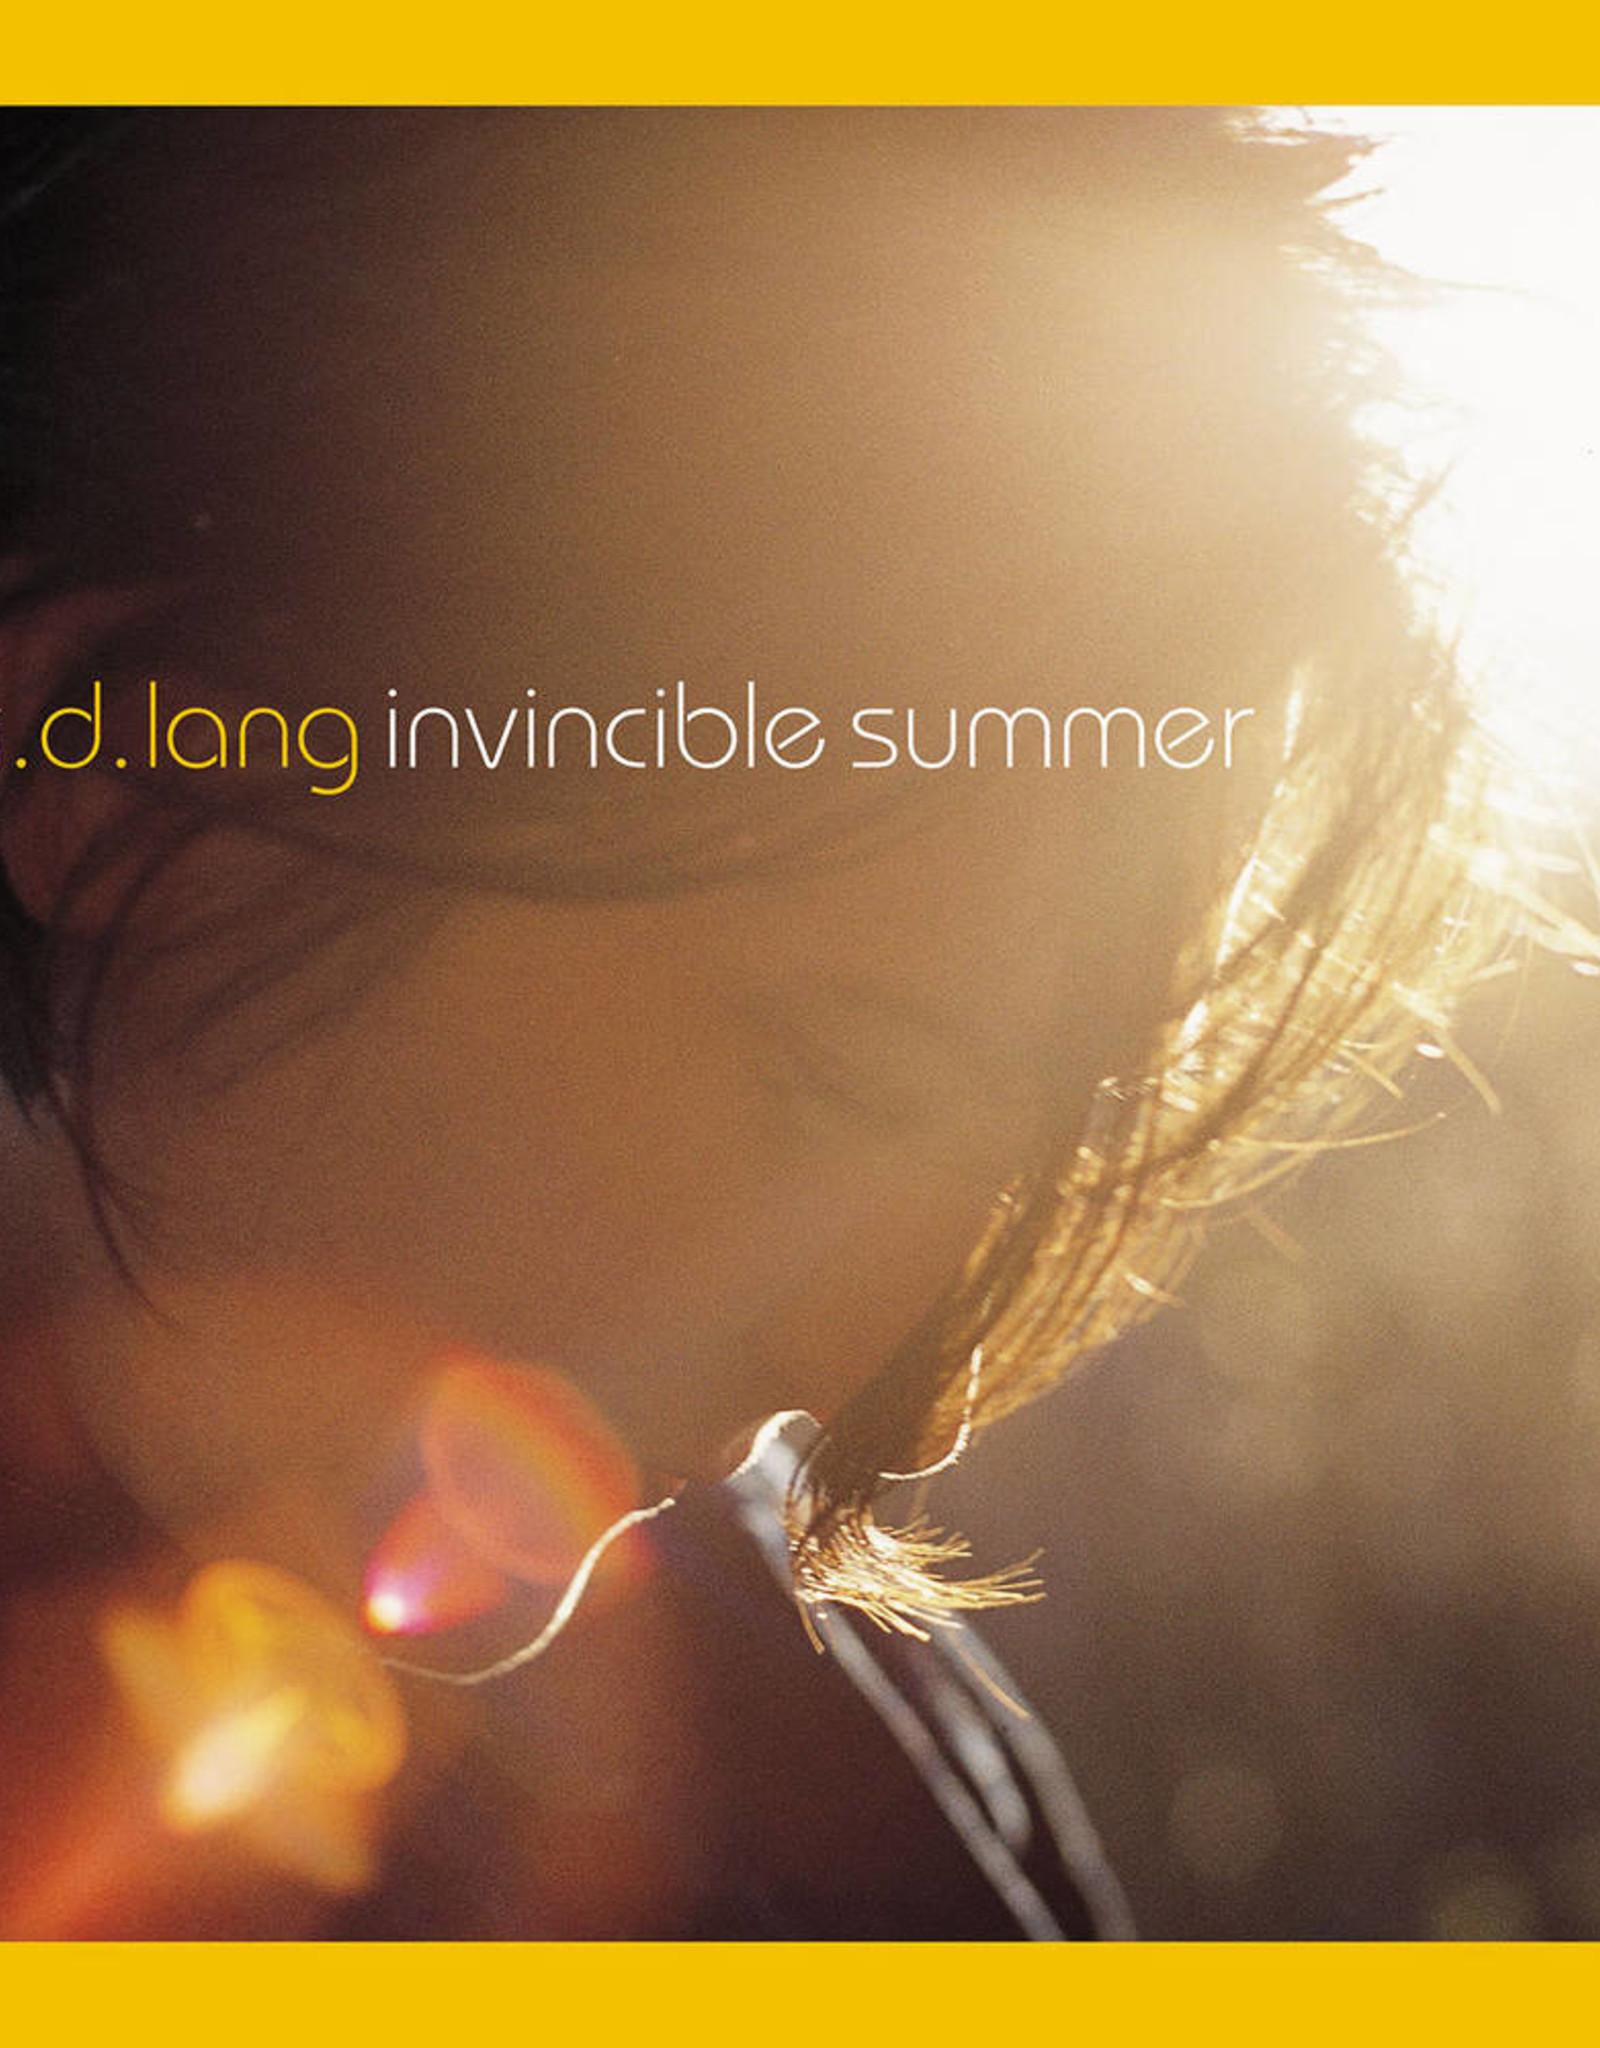 k.d. lang - Invincible Summer 20th Anniversary Edition (Yellow-Orange Vinyl)